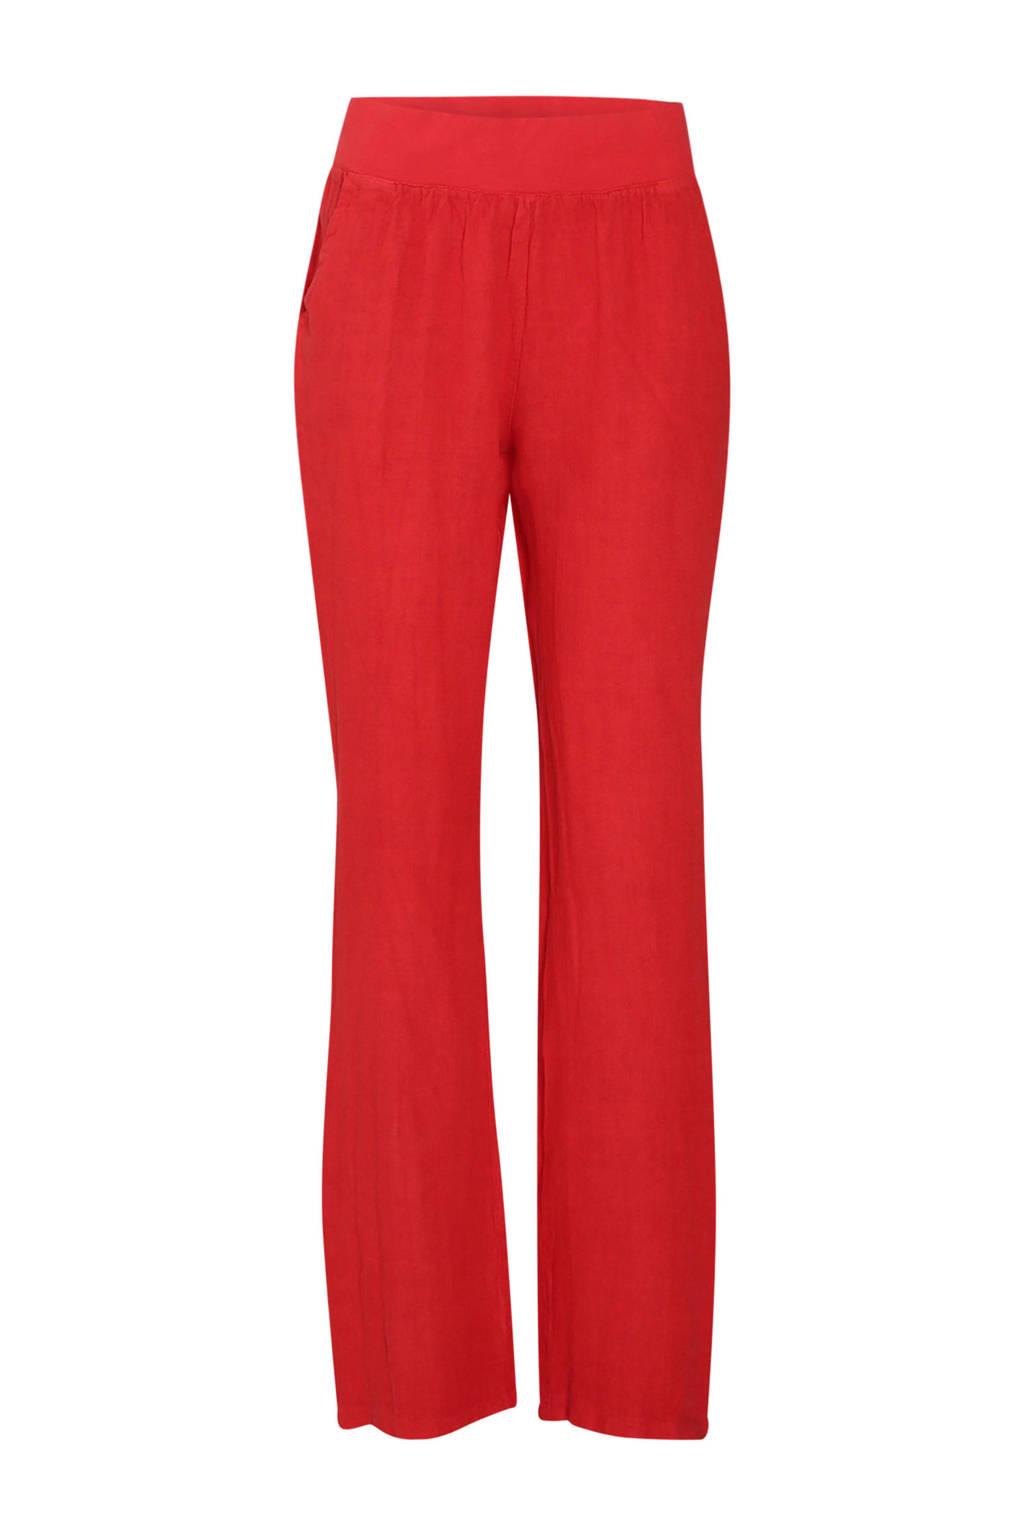 Cassis loose fit broek rood, Rood